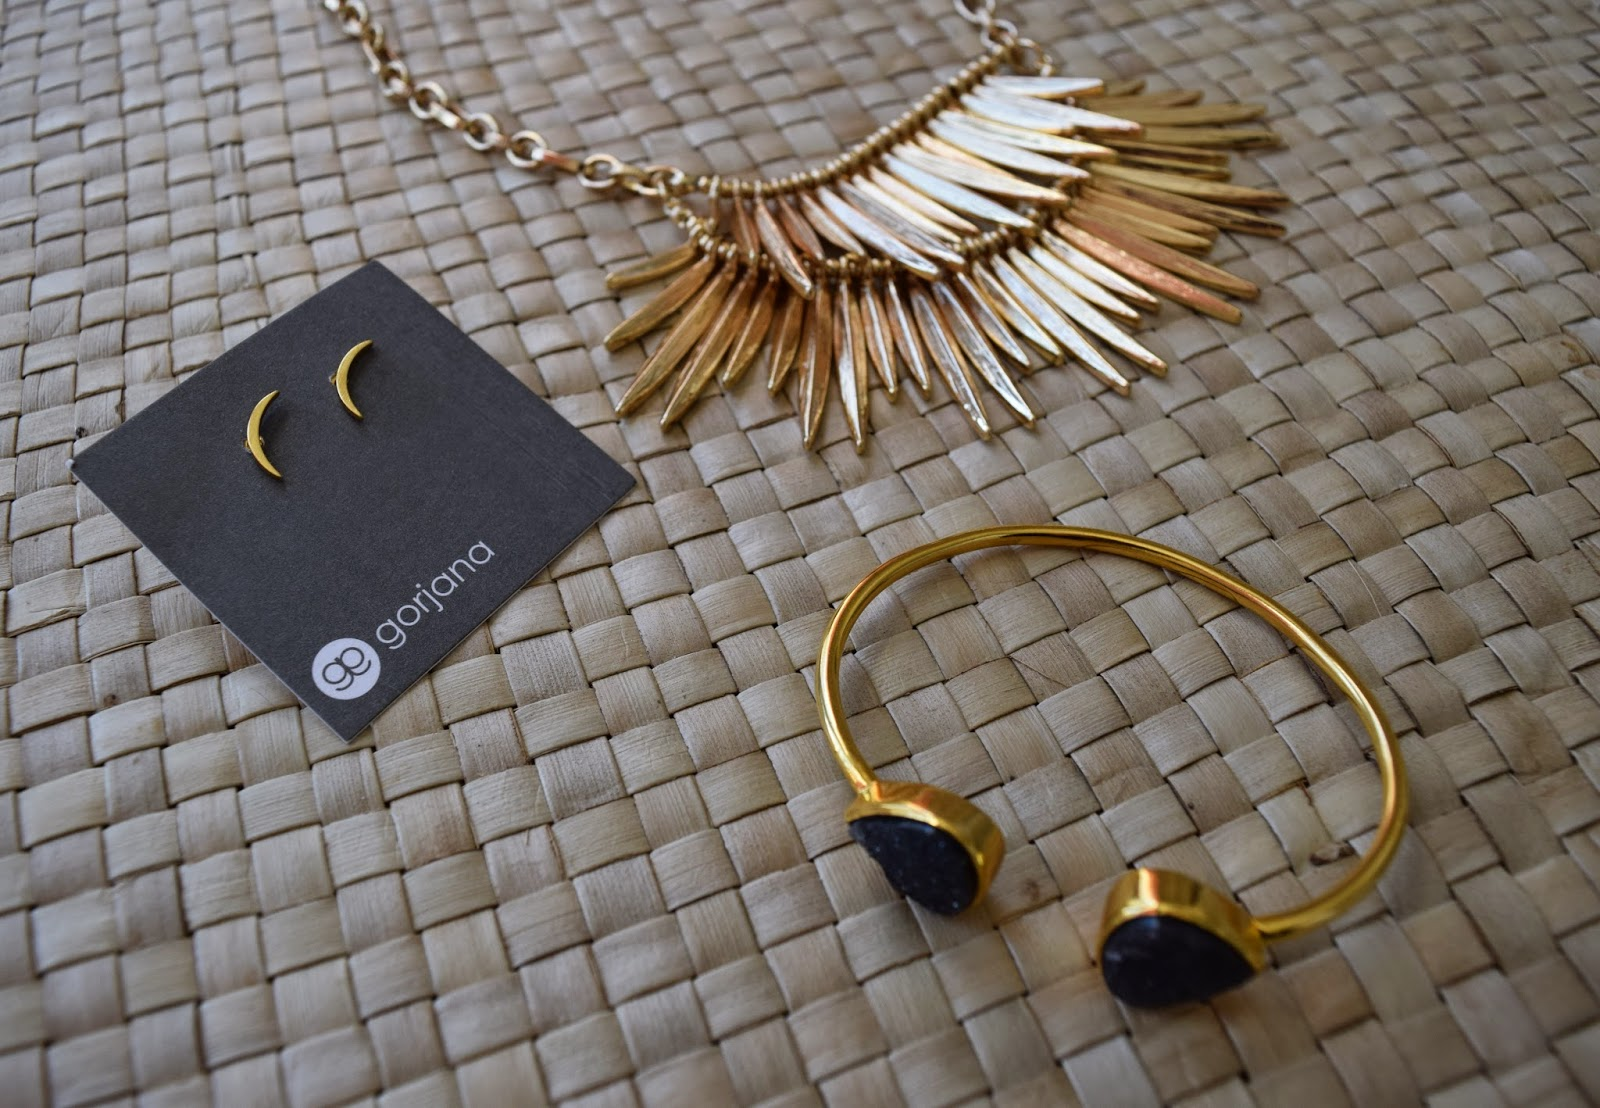 rocksbox-subscription-box-margaret-elizabeth-slate-gorjana-jewelry